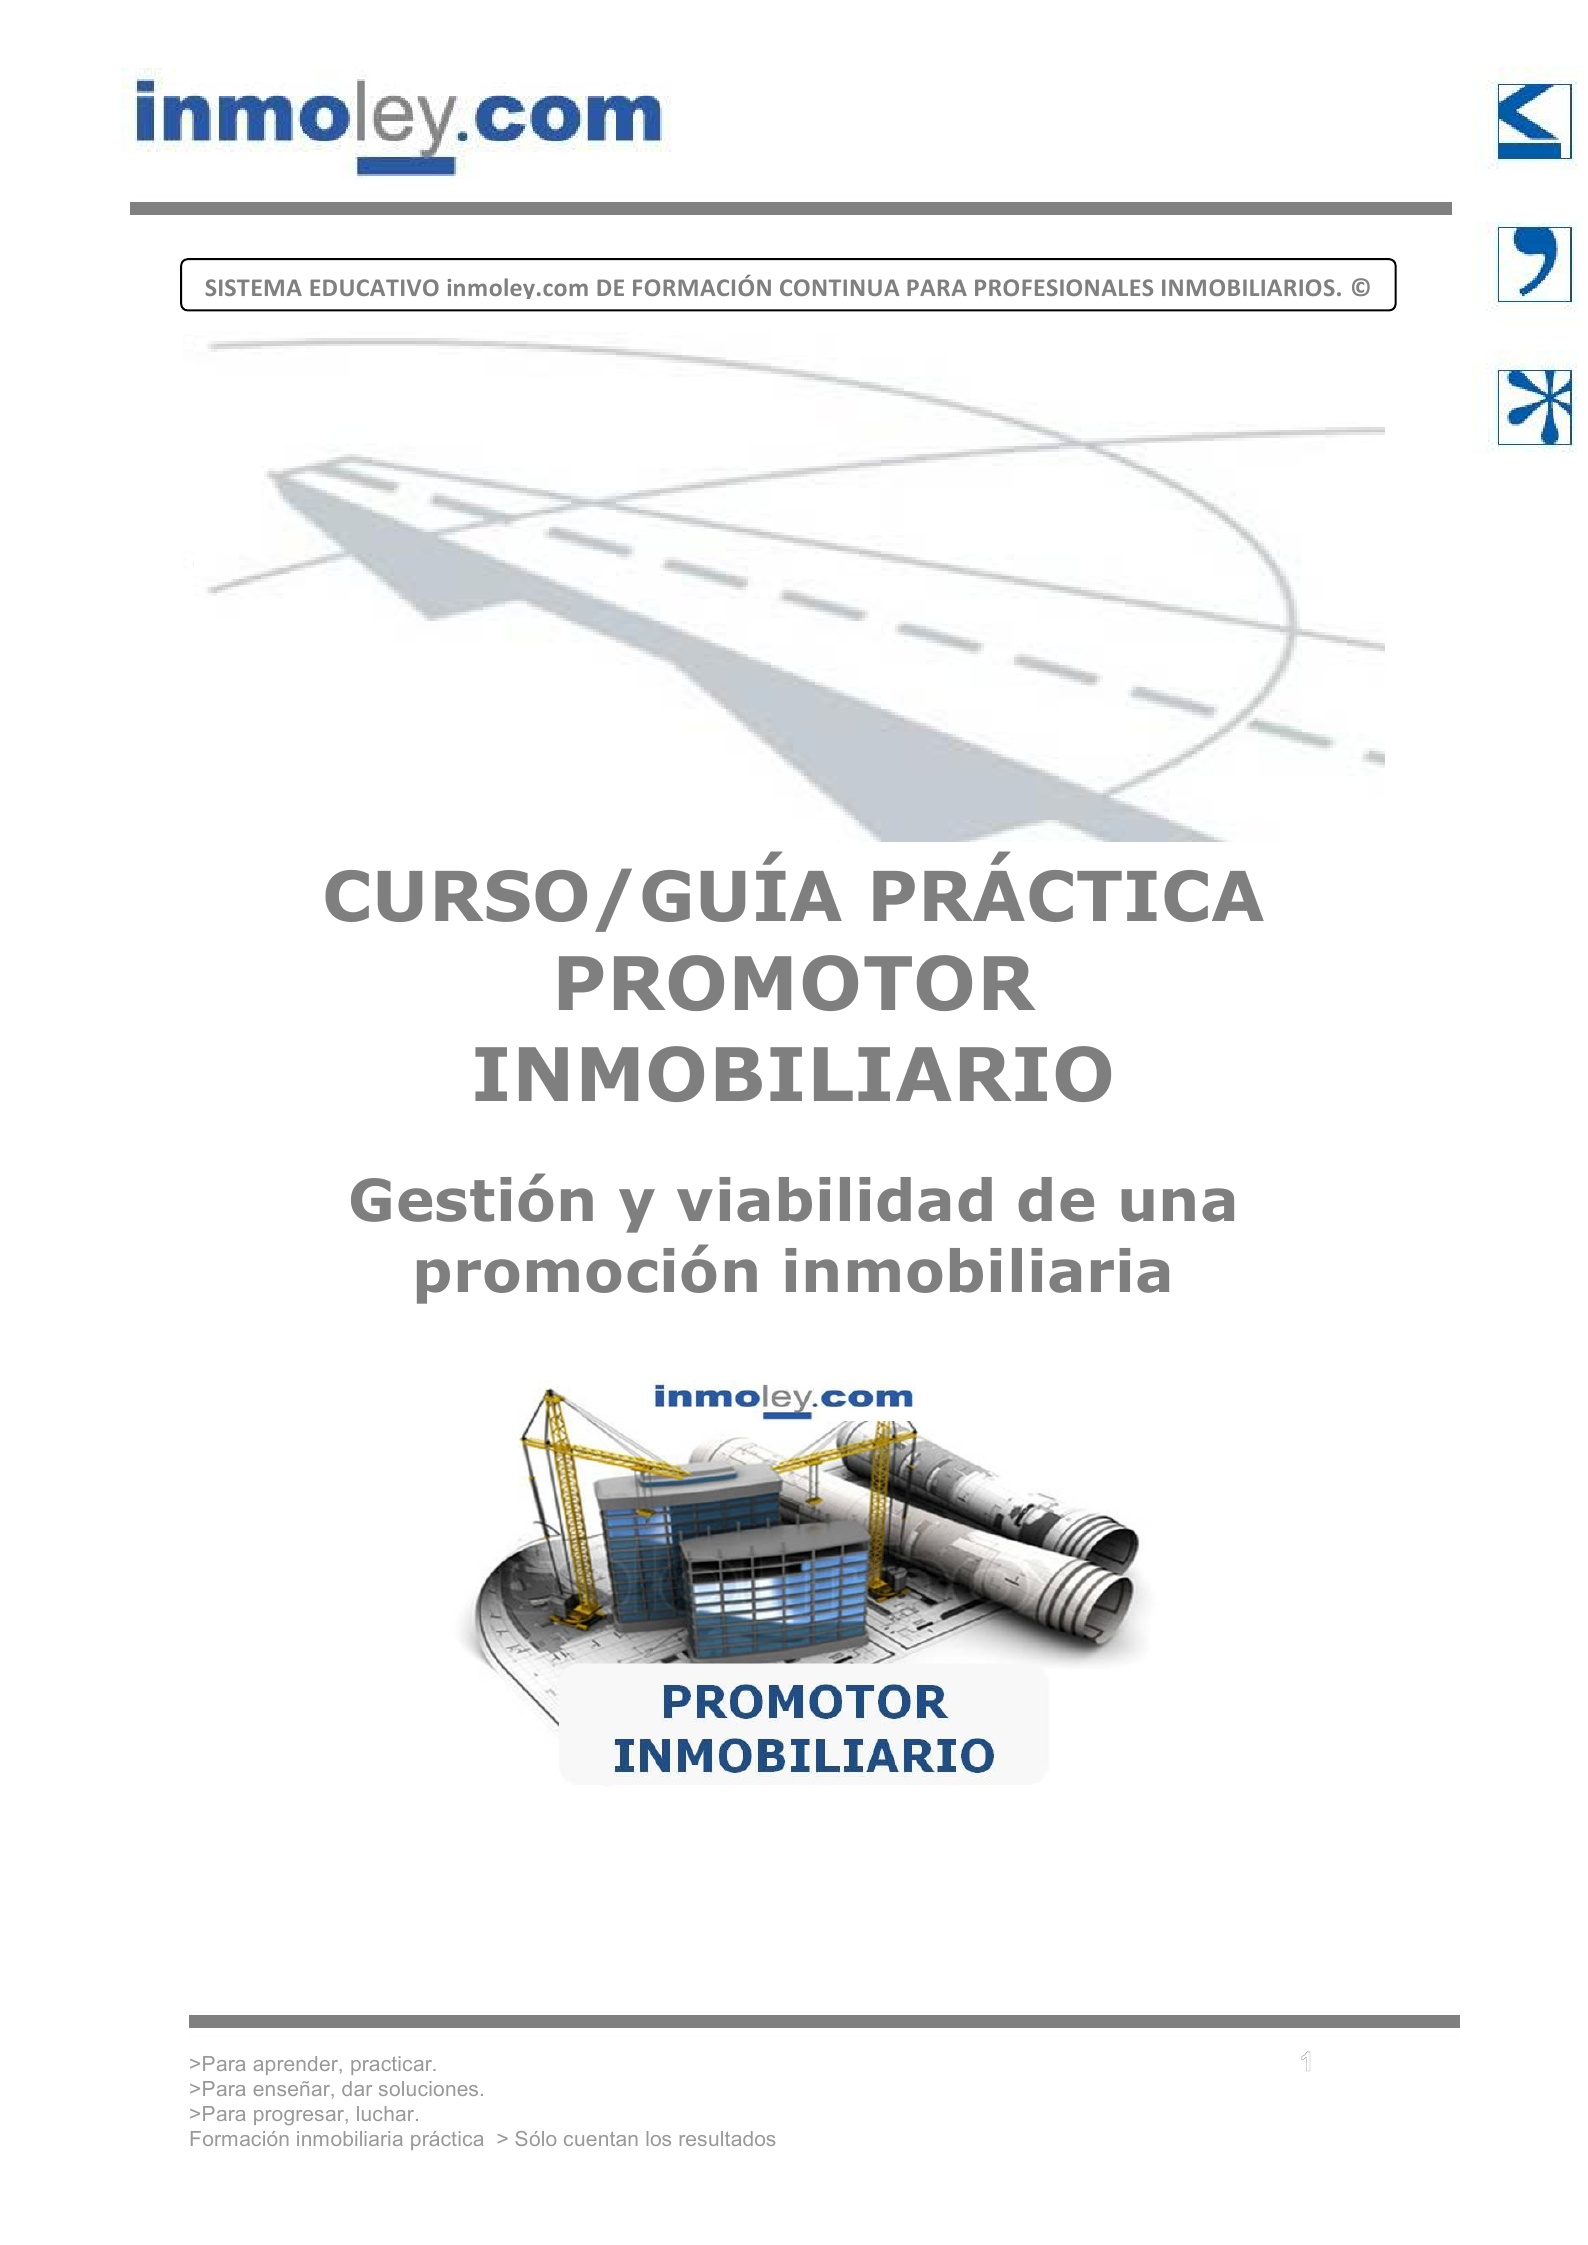 Promotor inmobiliario promoci n inmobiliaria for Promocion inmobiliaria